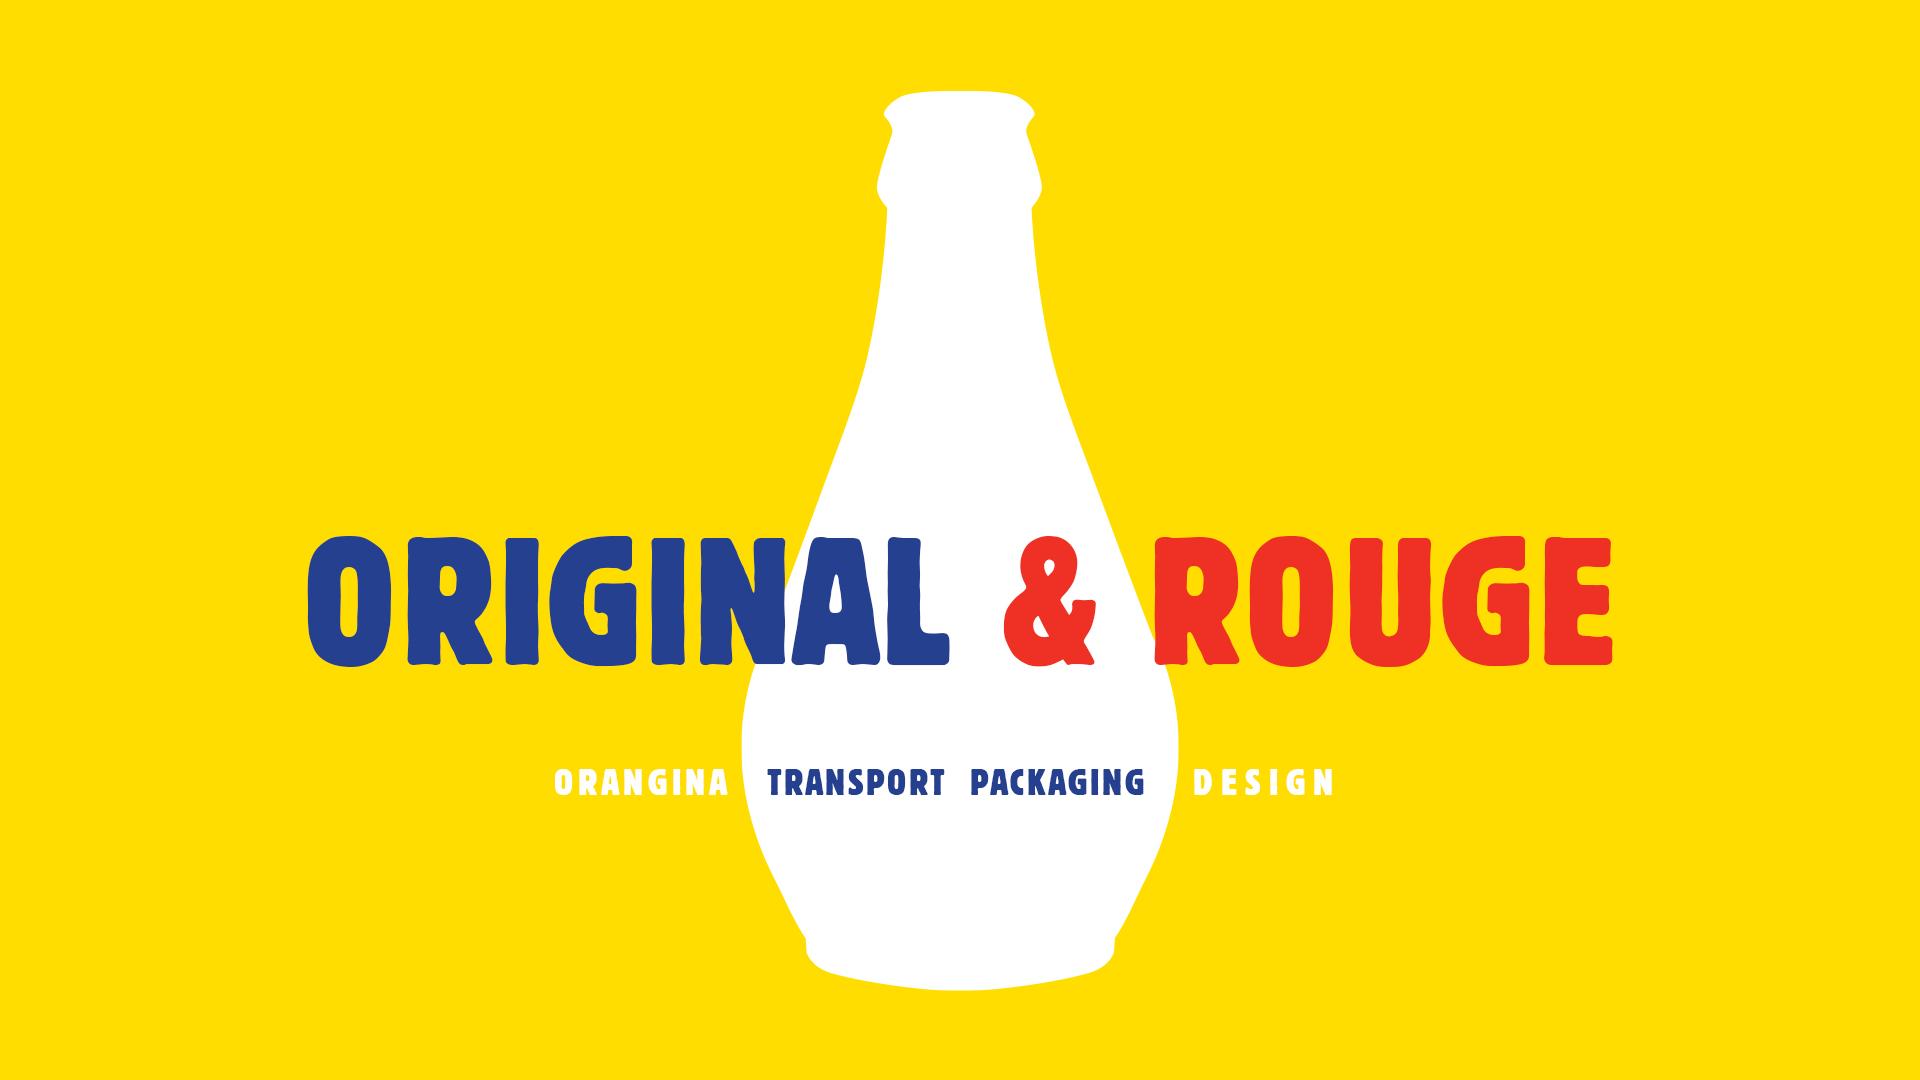 Orangina-Transport-Packaging-by-Emtisquare-2